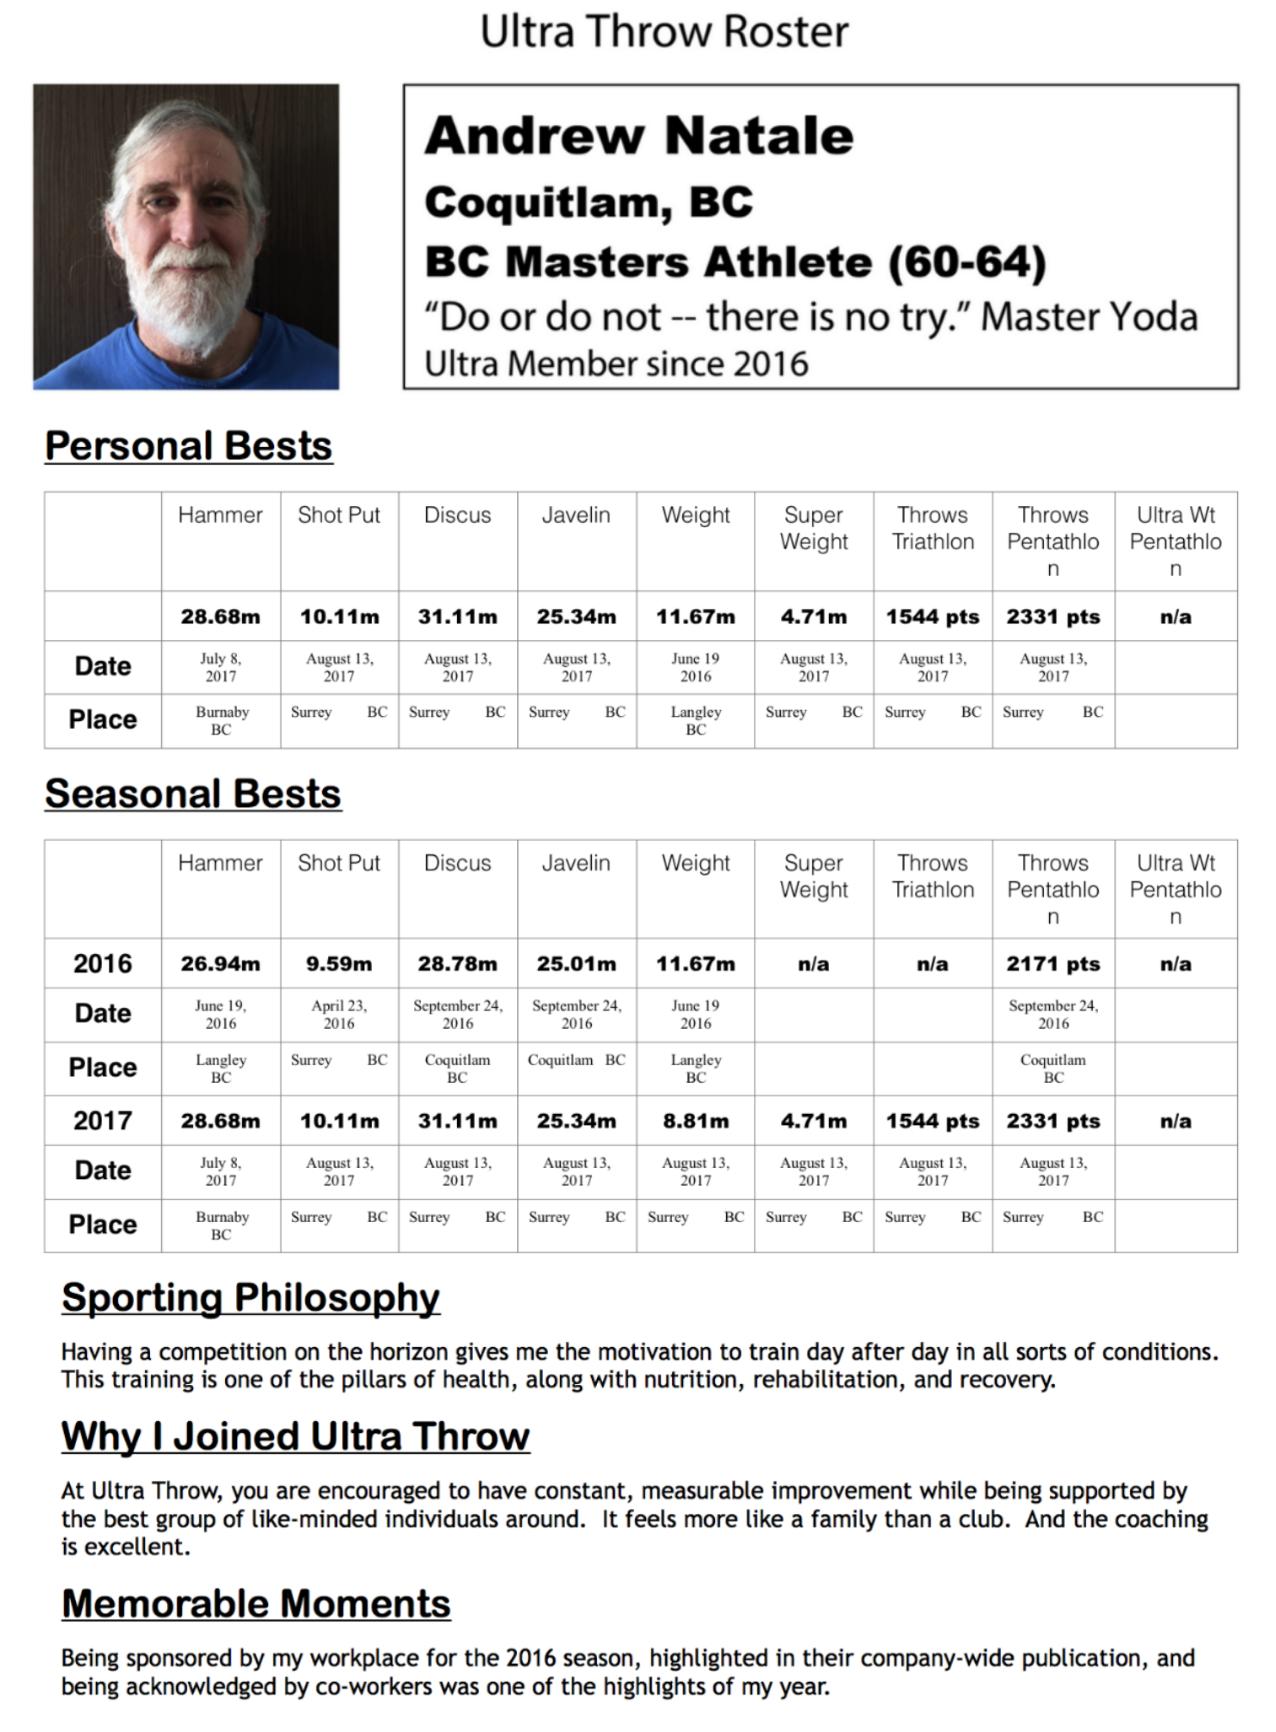 Andrew natale, bc masters athlete (60-64), coquitlam, bc